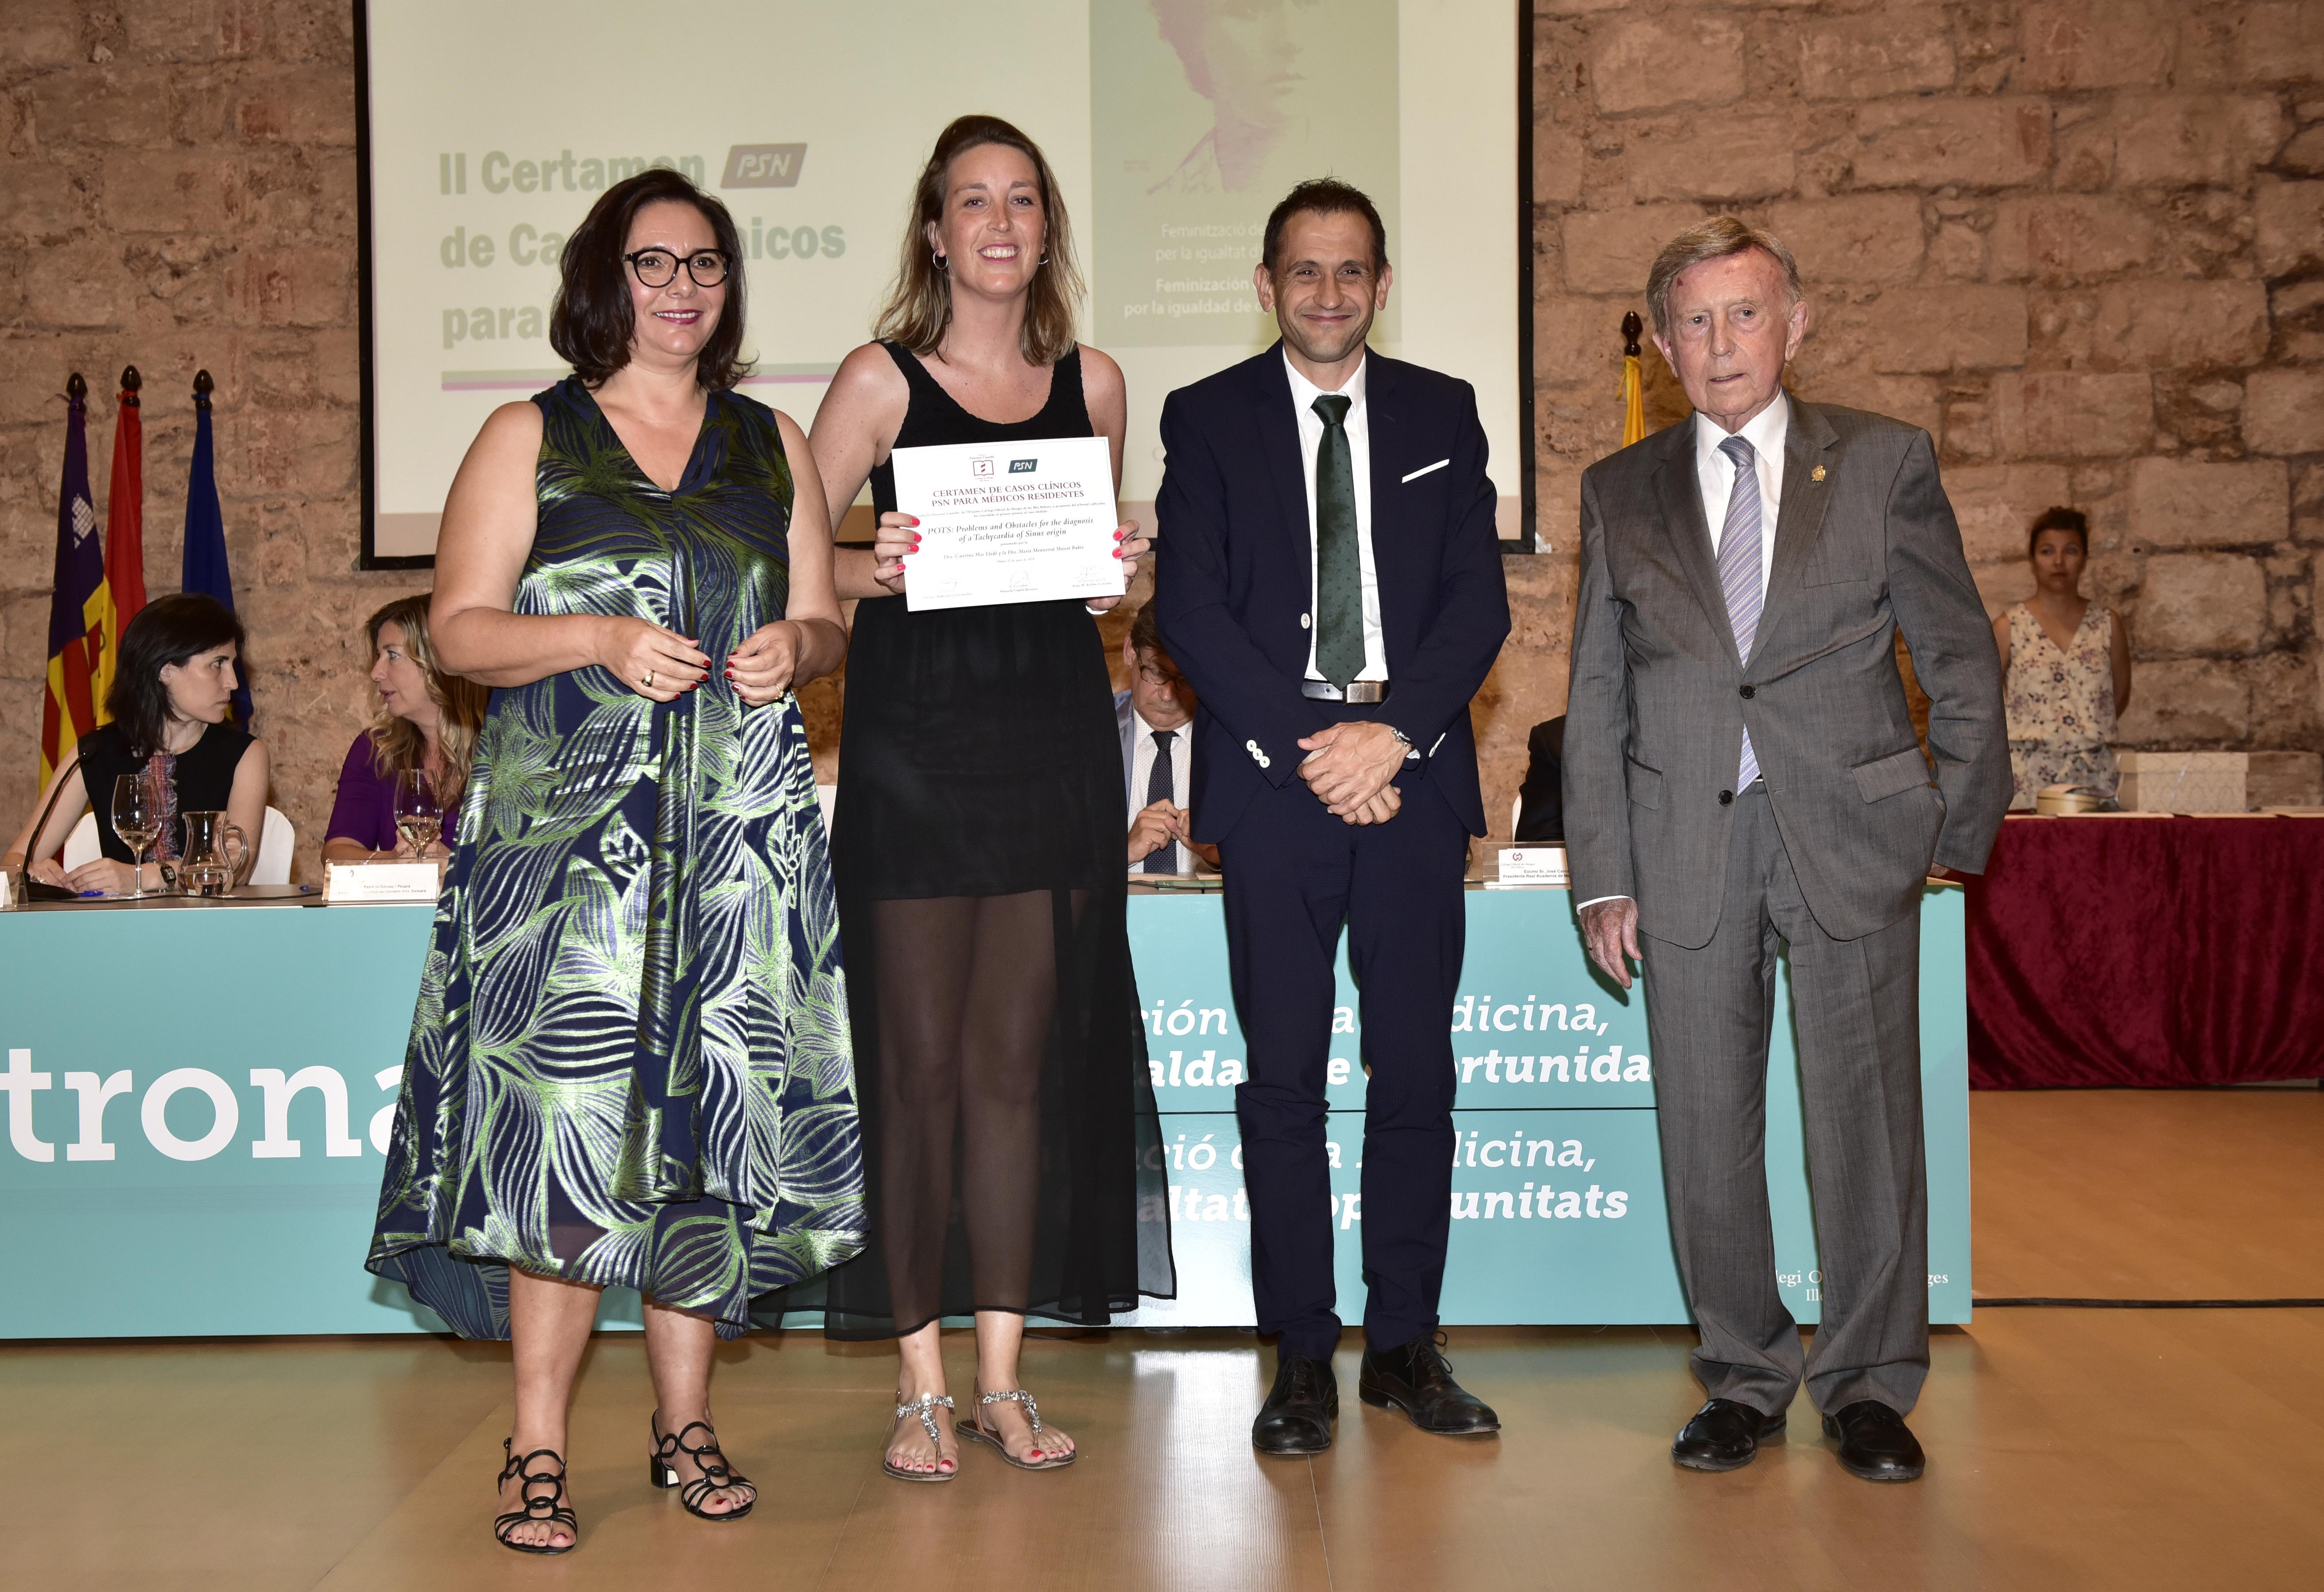 La Dra. Caterina Mas Lladó recoge el premio